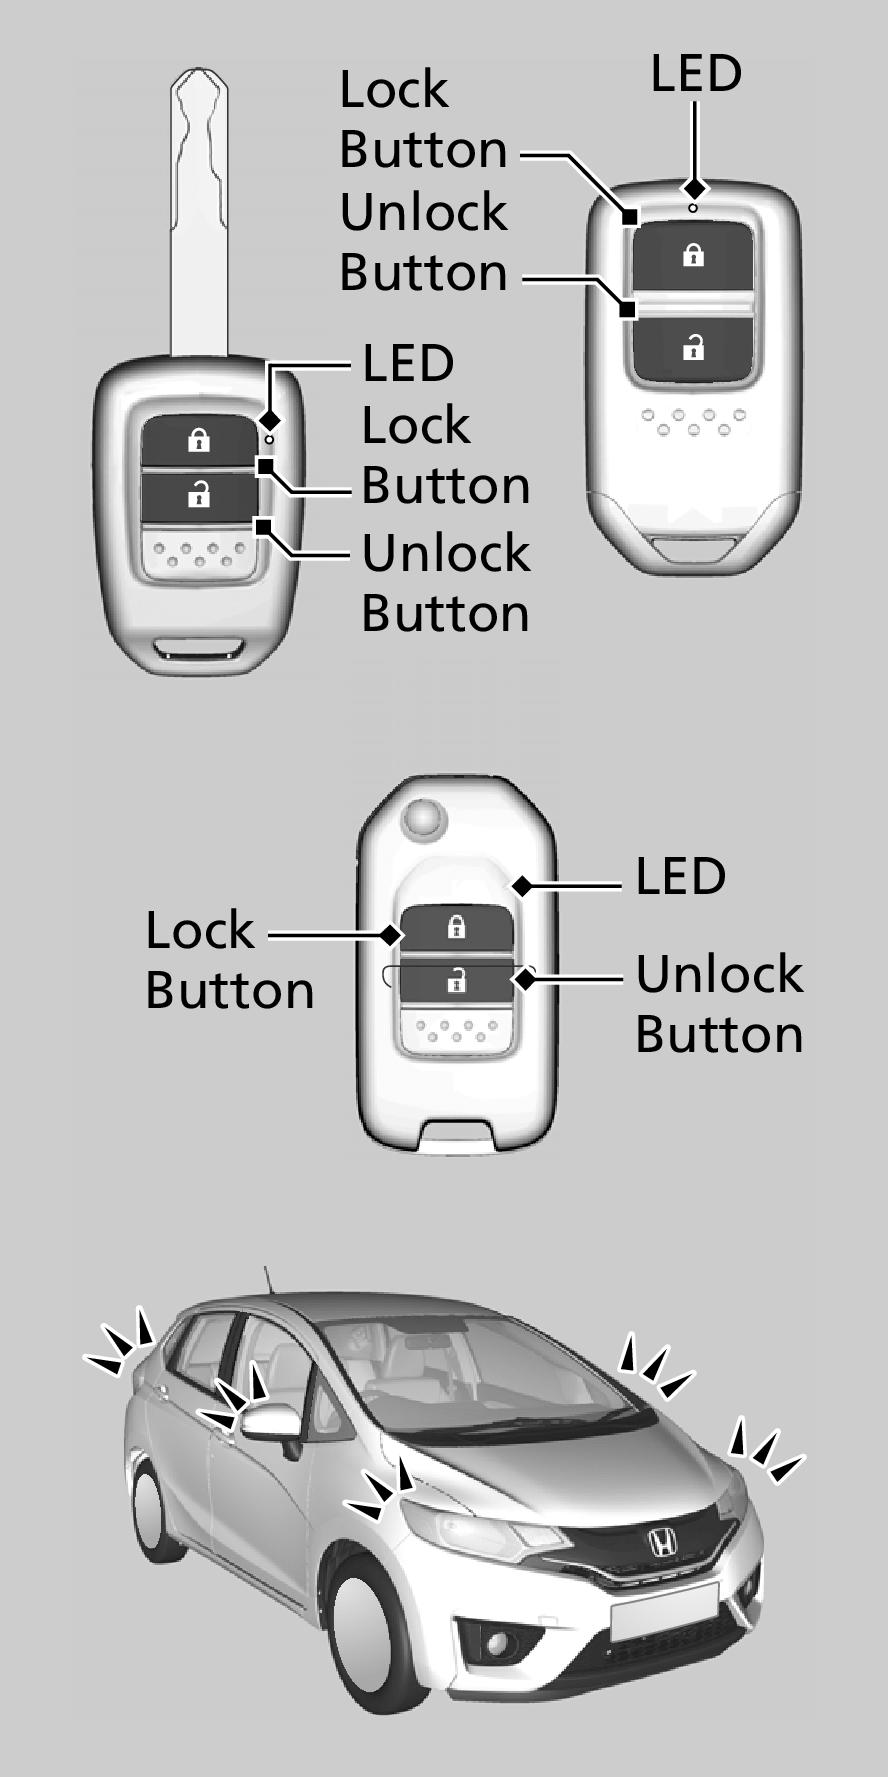 Car Remote Unlocker >> Locking Unlocking The Doors From The Outside Jazz 2016 Honda